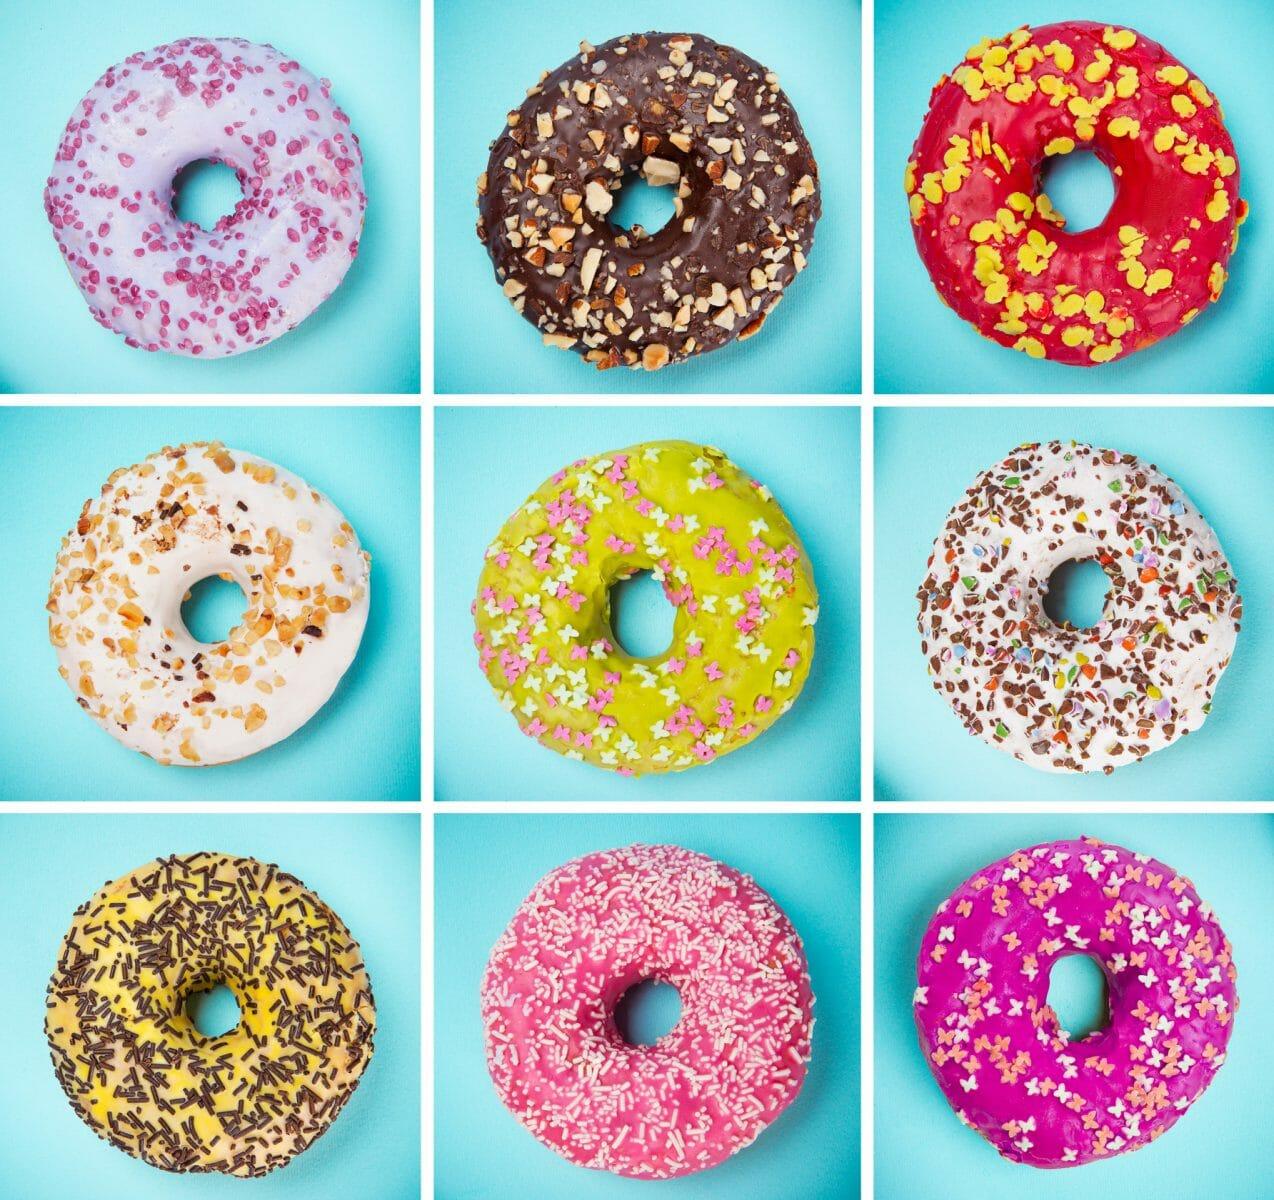 donuts as a metaphor for Woz U